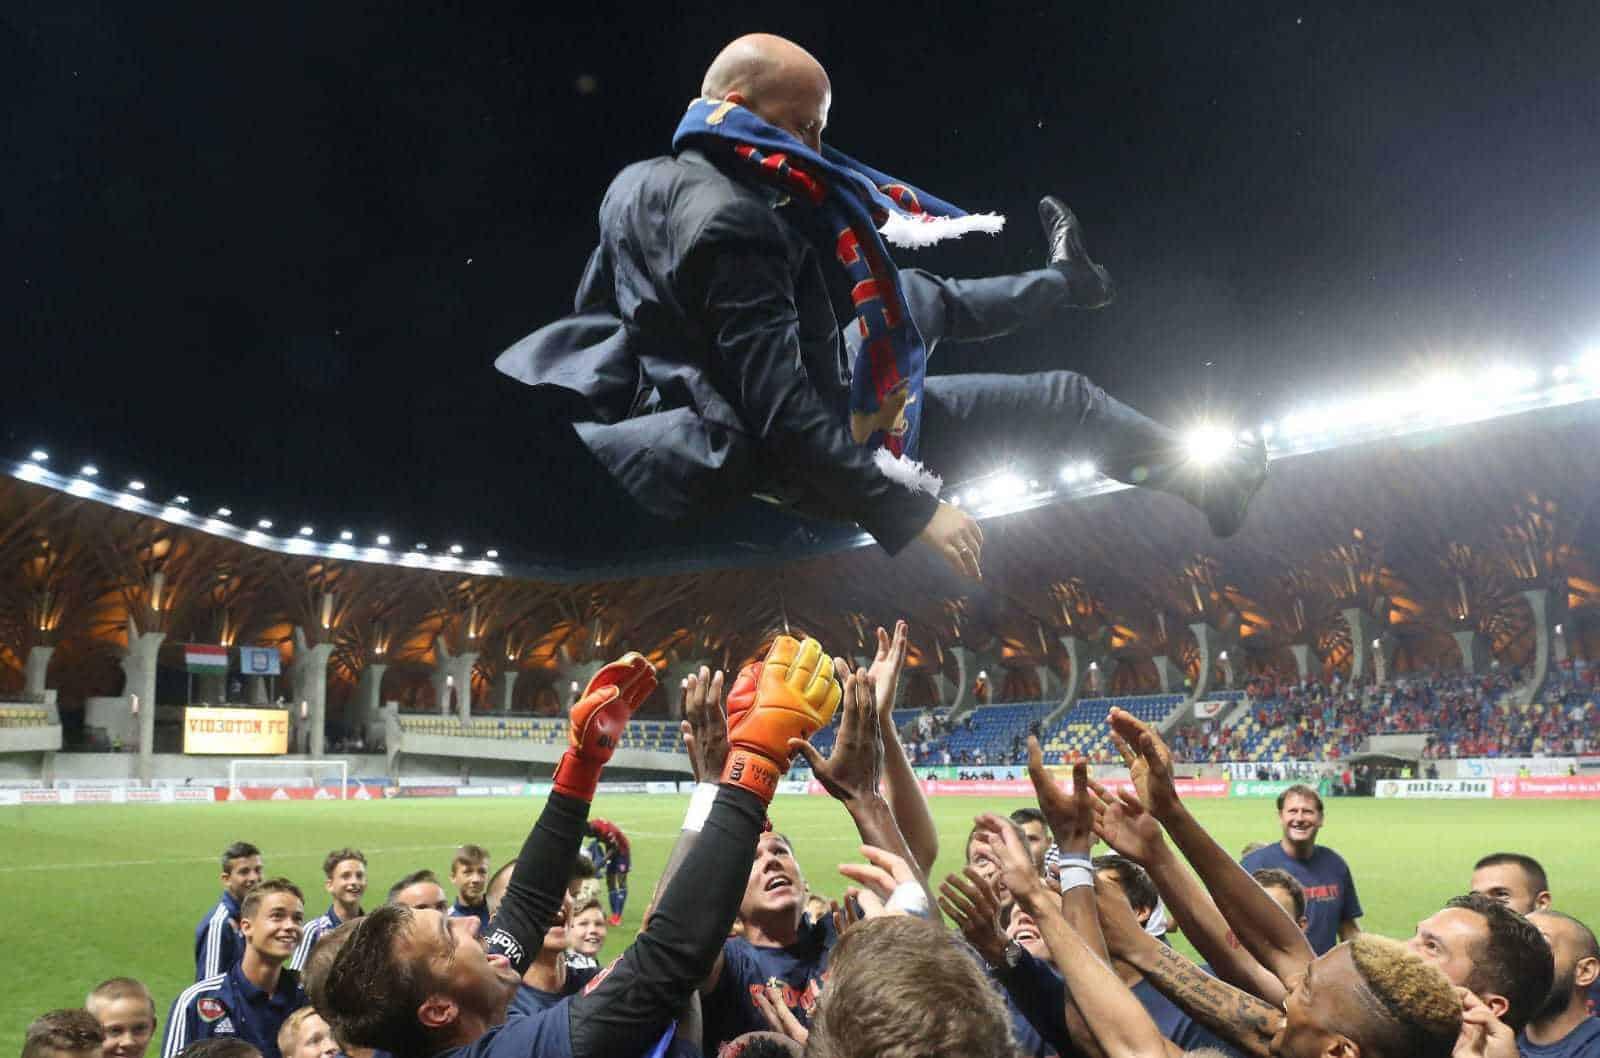 Tomas Tujvel Videoton FC